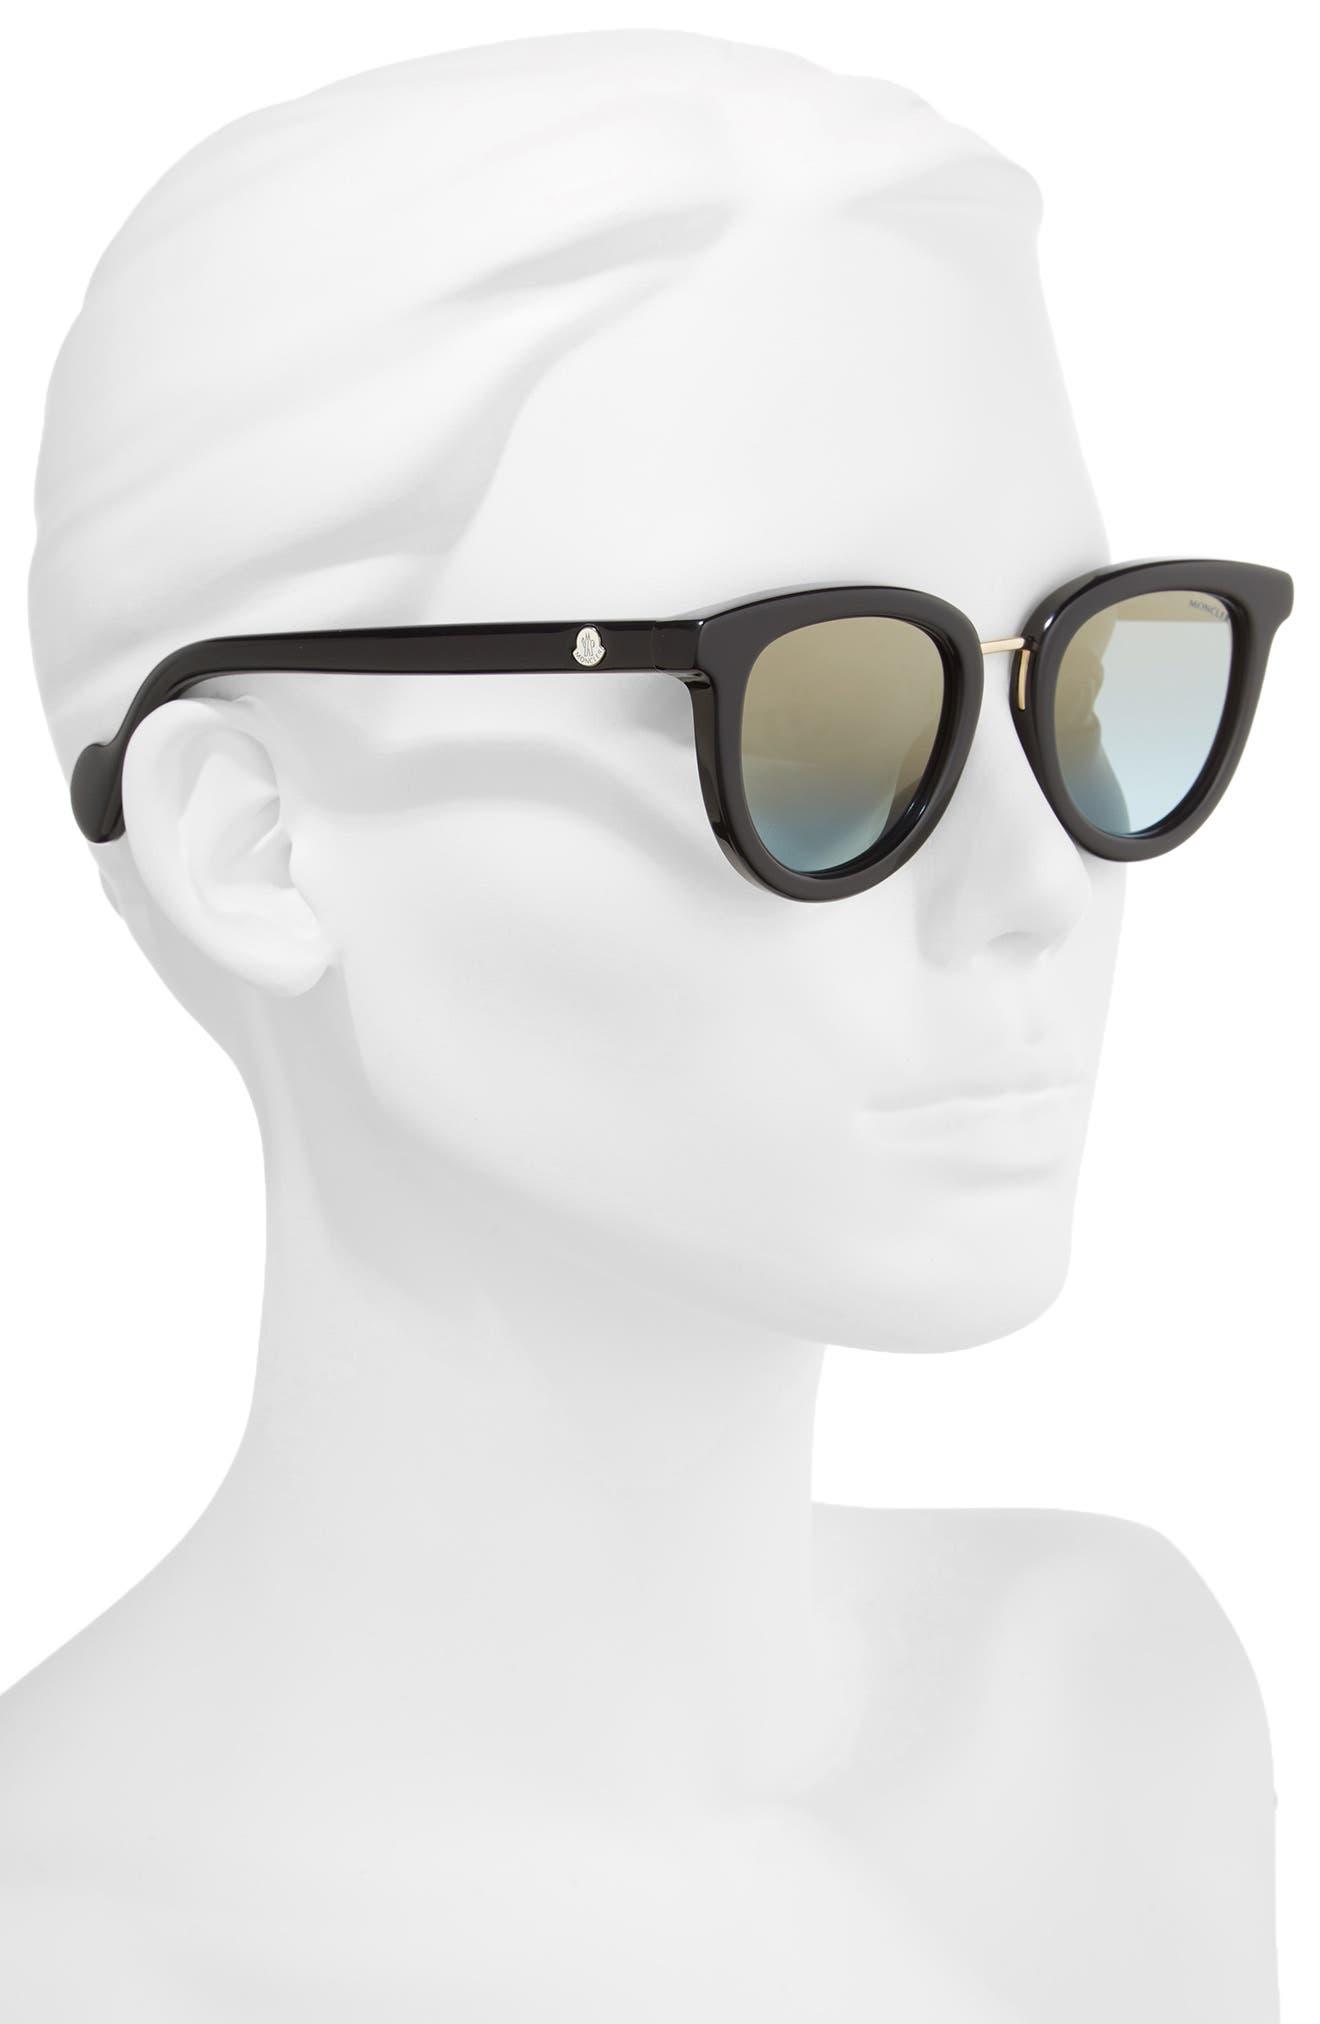 48mm Cat Eye Sunglasses,                             Alternate thumbnail 2, color,                             BLACK/ PALE GOLD/ LIGHT BLUE